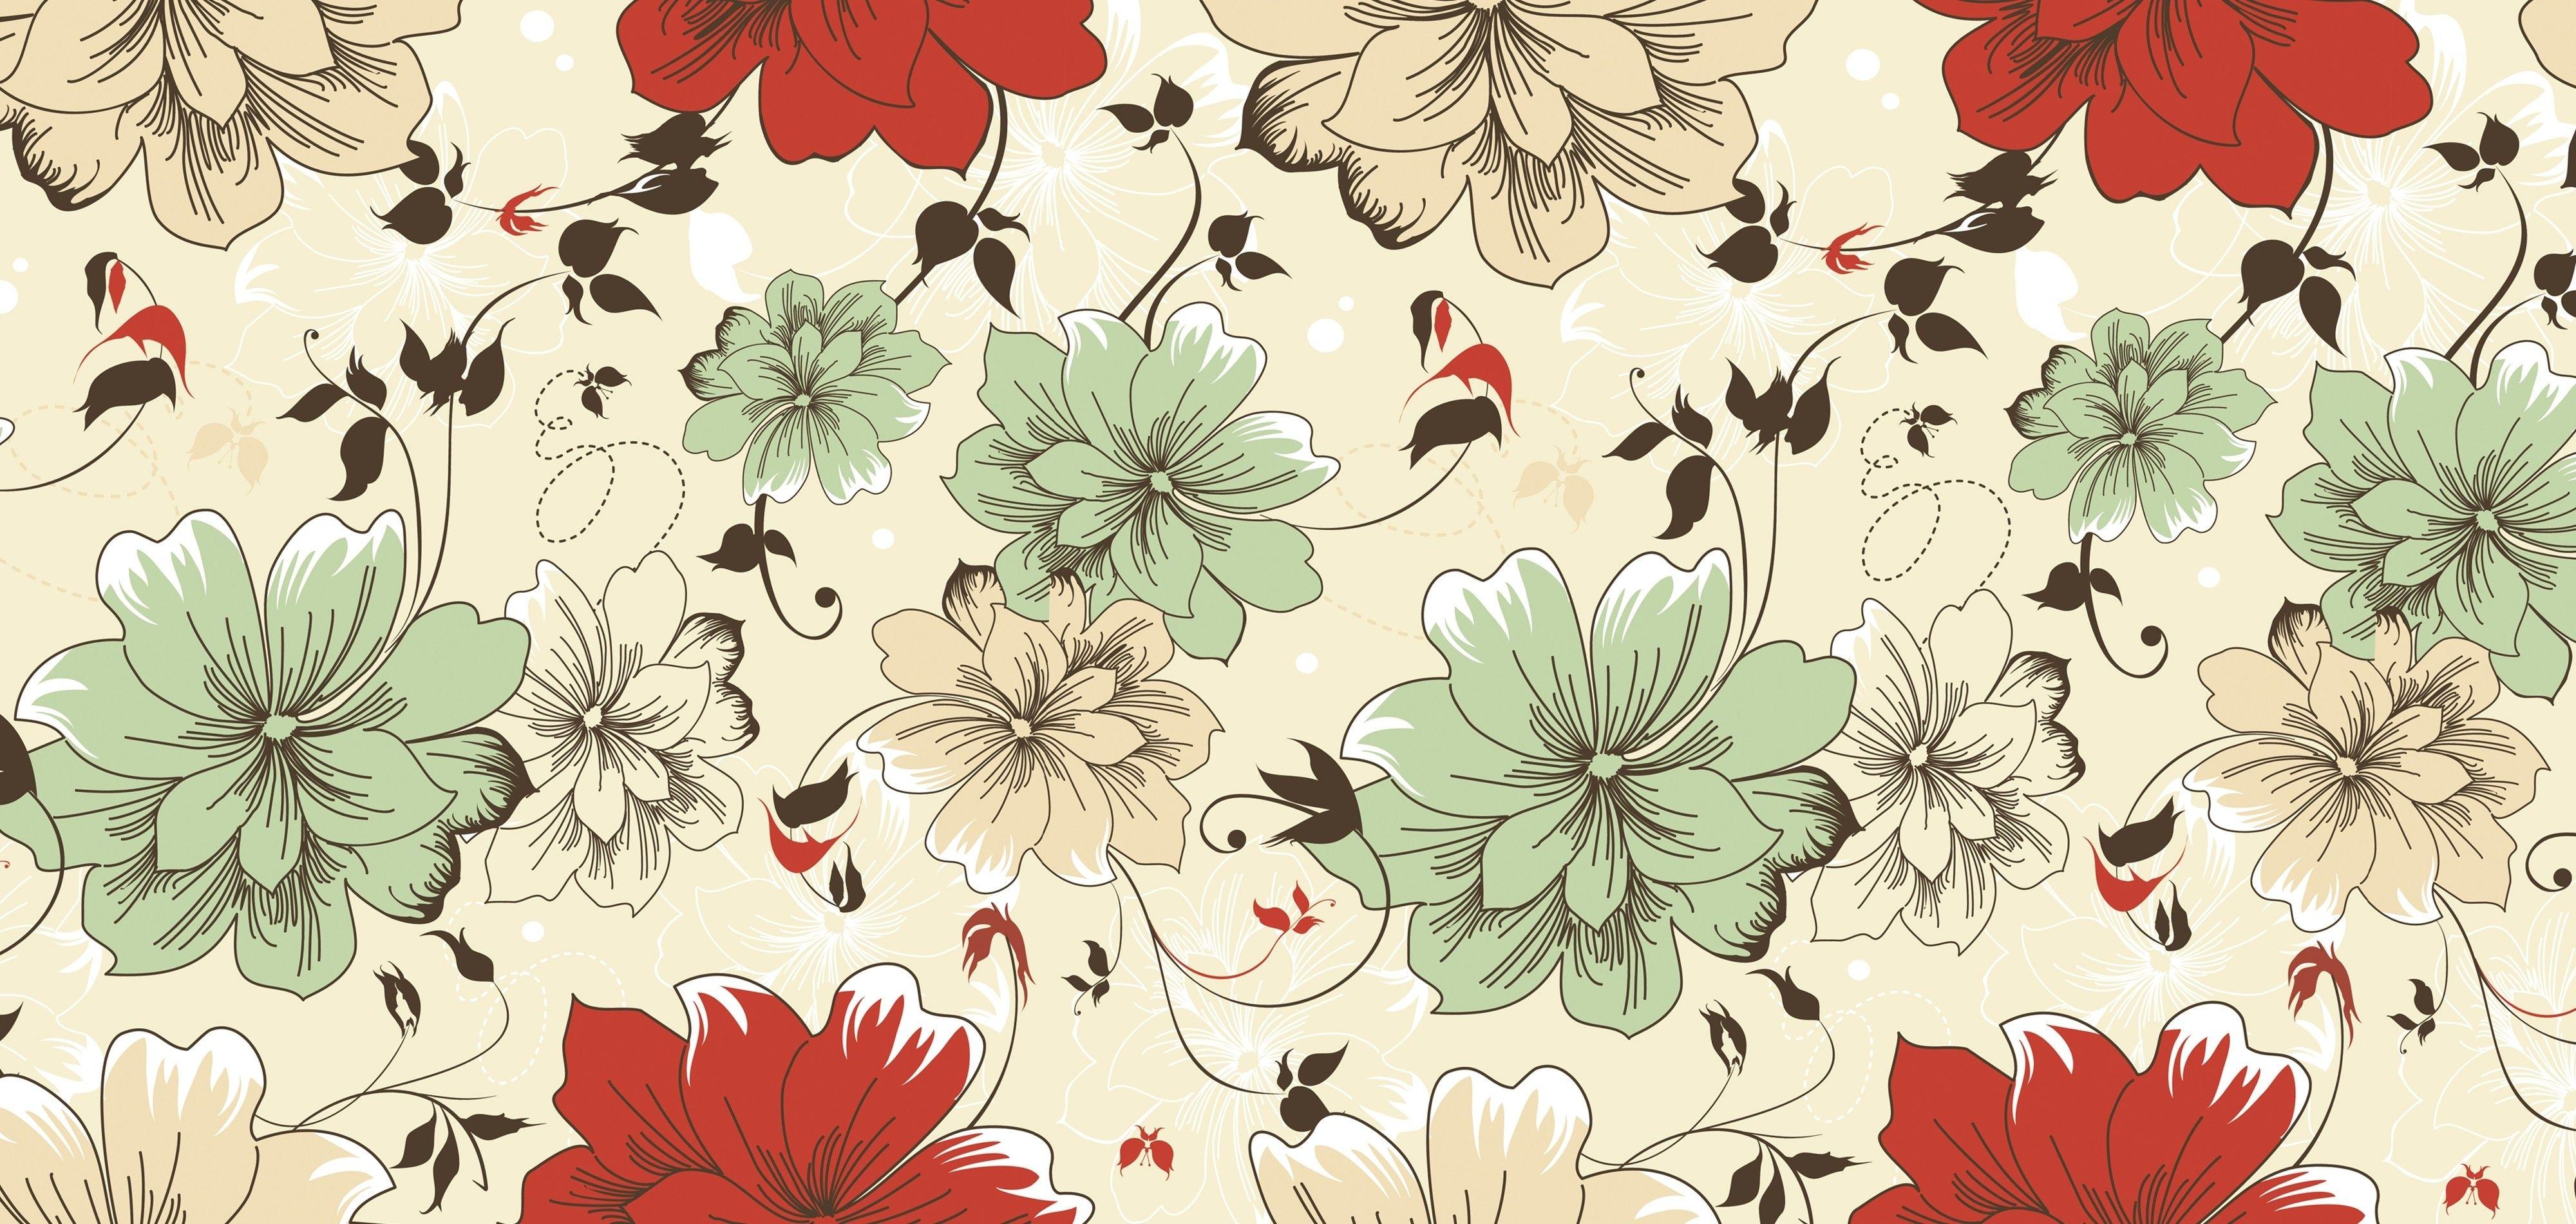 20 Vintage Wallpapers For Retro Look Vintage Flowers Wallpaper